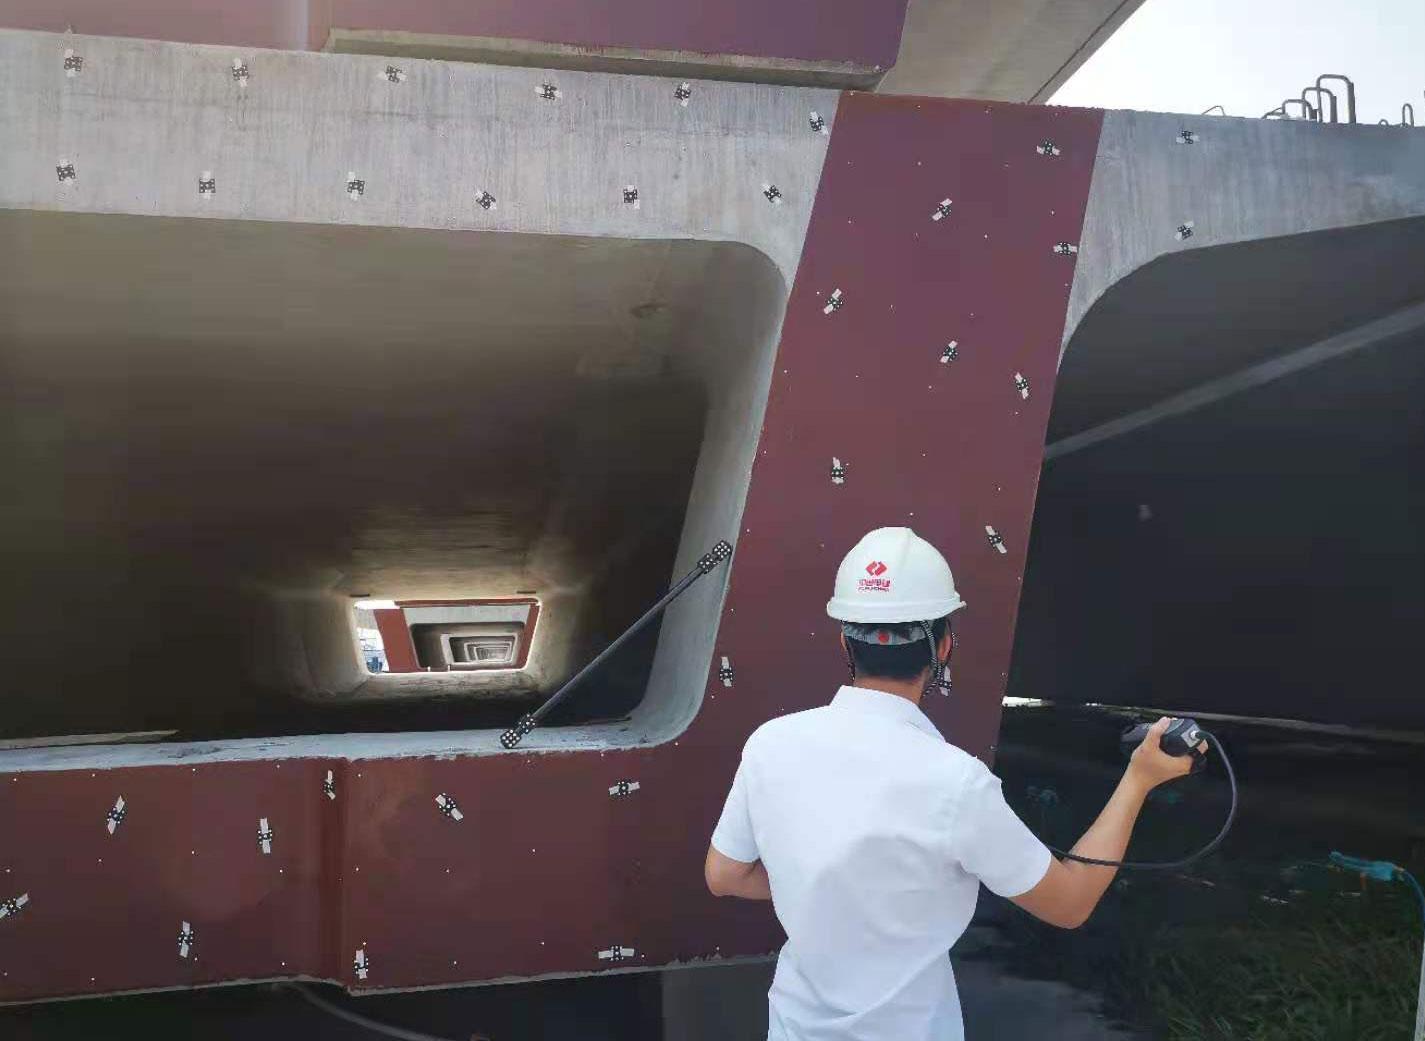 Application of KSCAN-MAGIC 3D Scanner in Railway Bridge Inspection 3